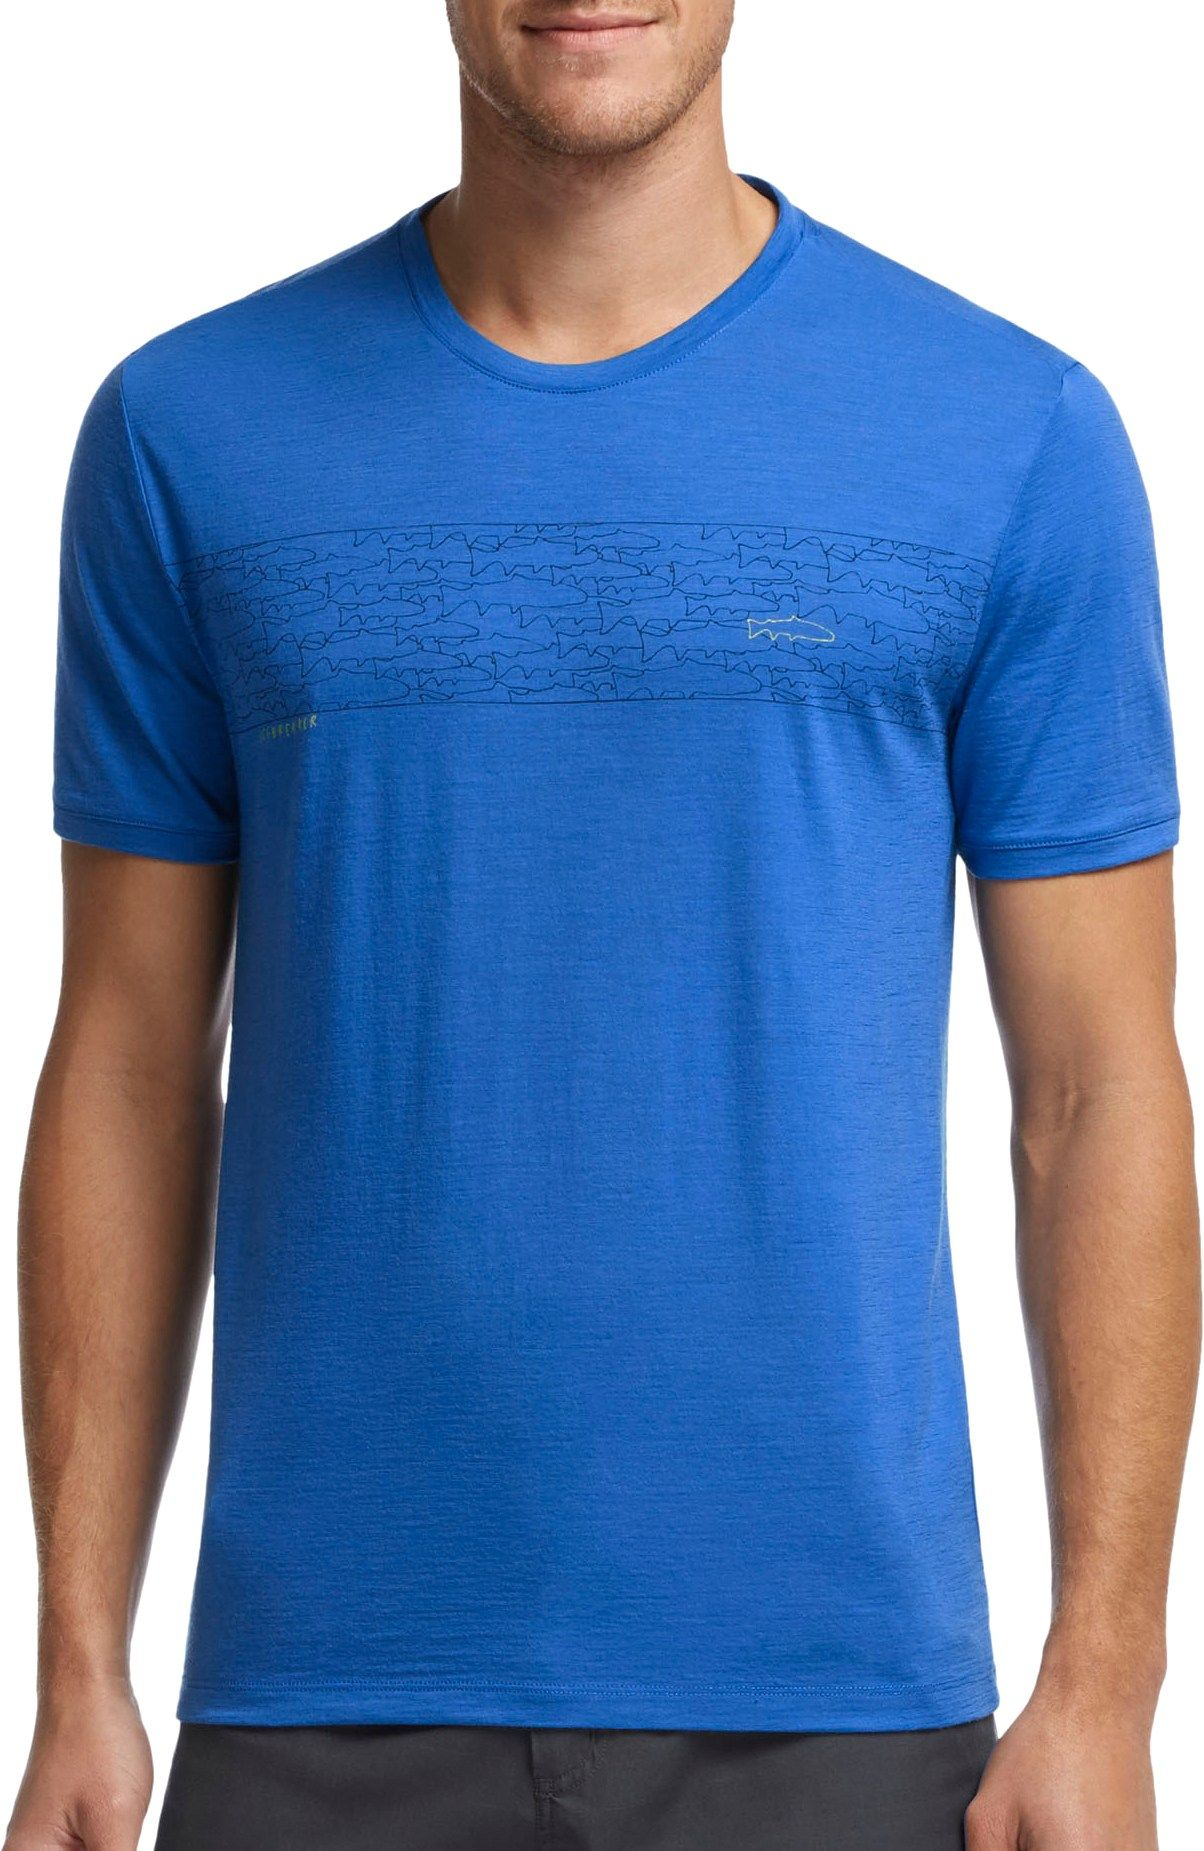 06cfb24449 Icebreaker Male Tech Lite School's Out T-Shirt - Men's | *Apparel ...